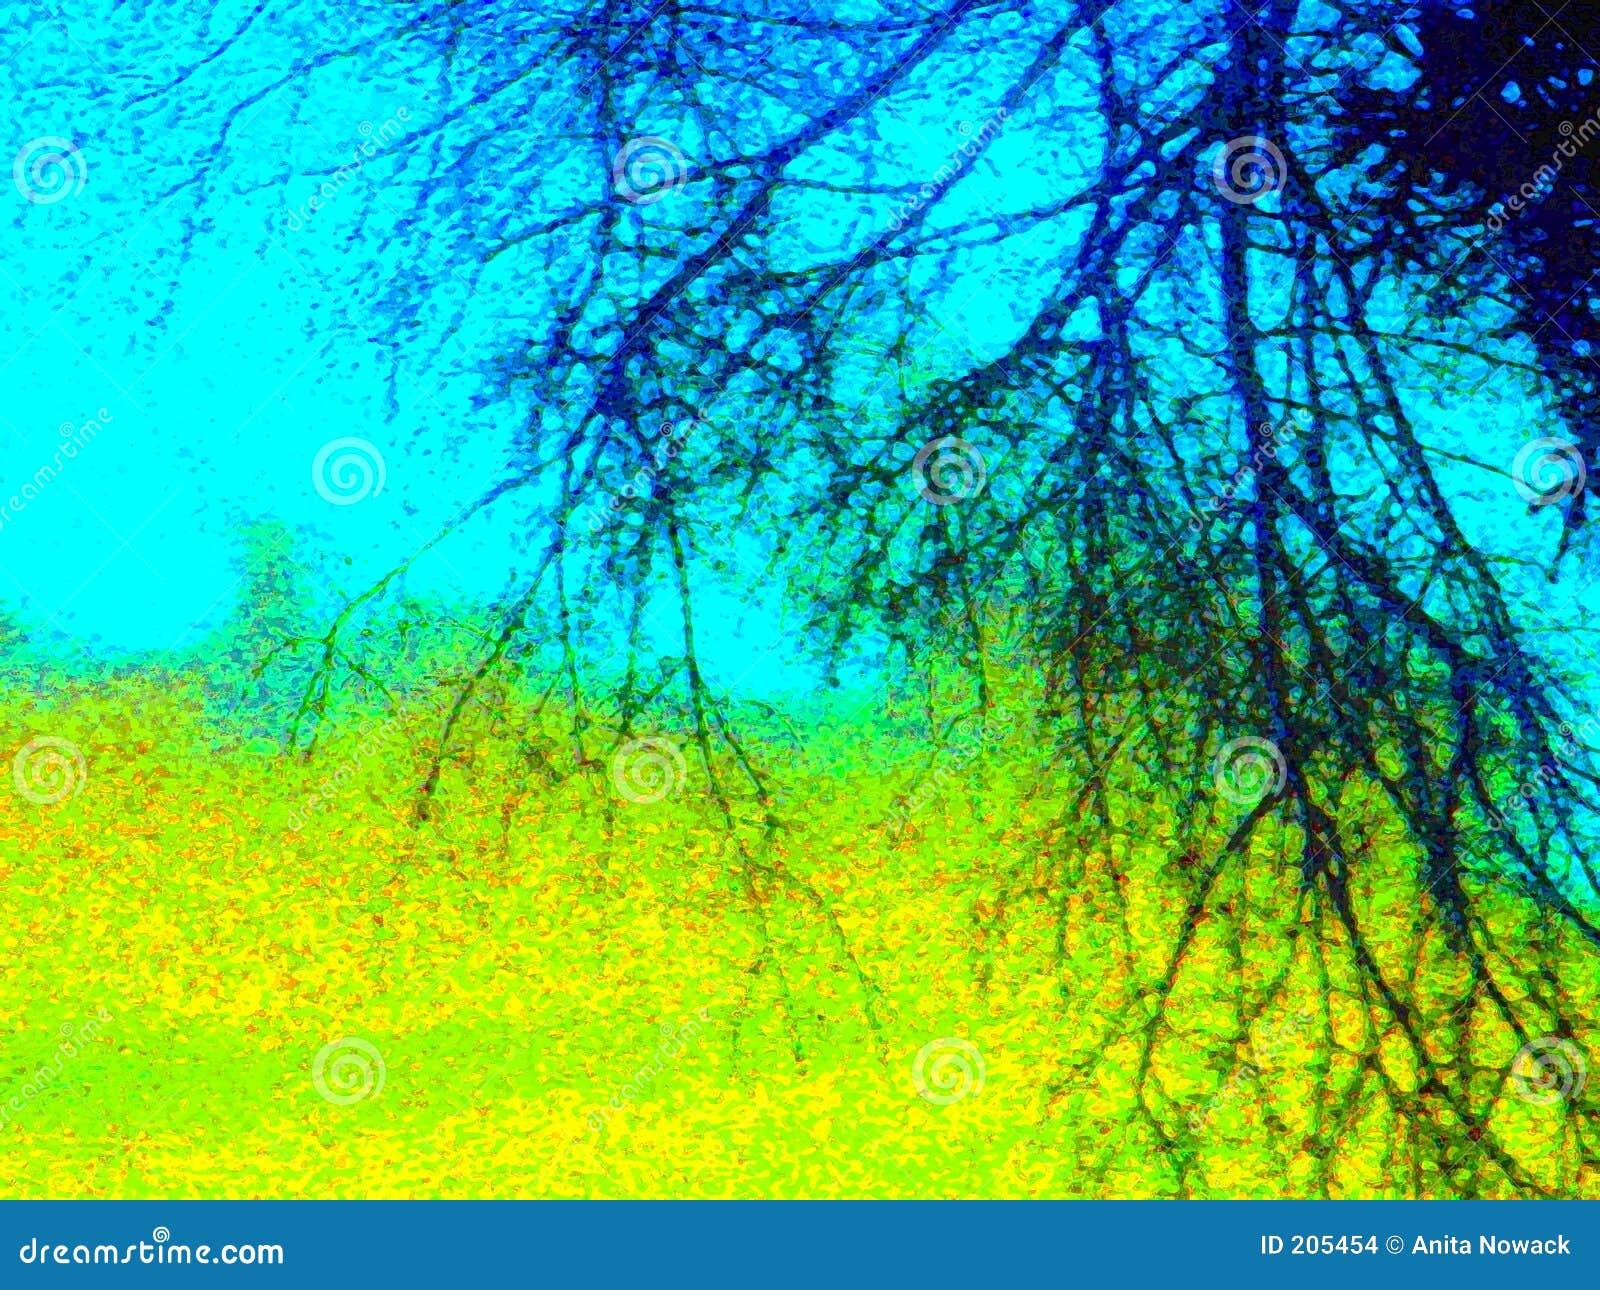 scenery background stock photo. image of quietness, background - 205454